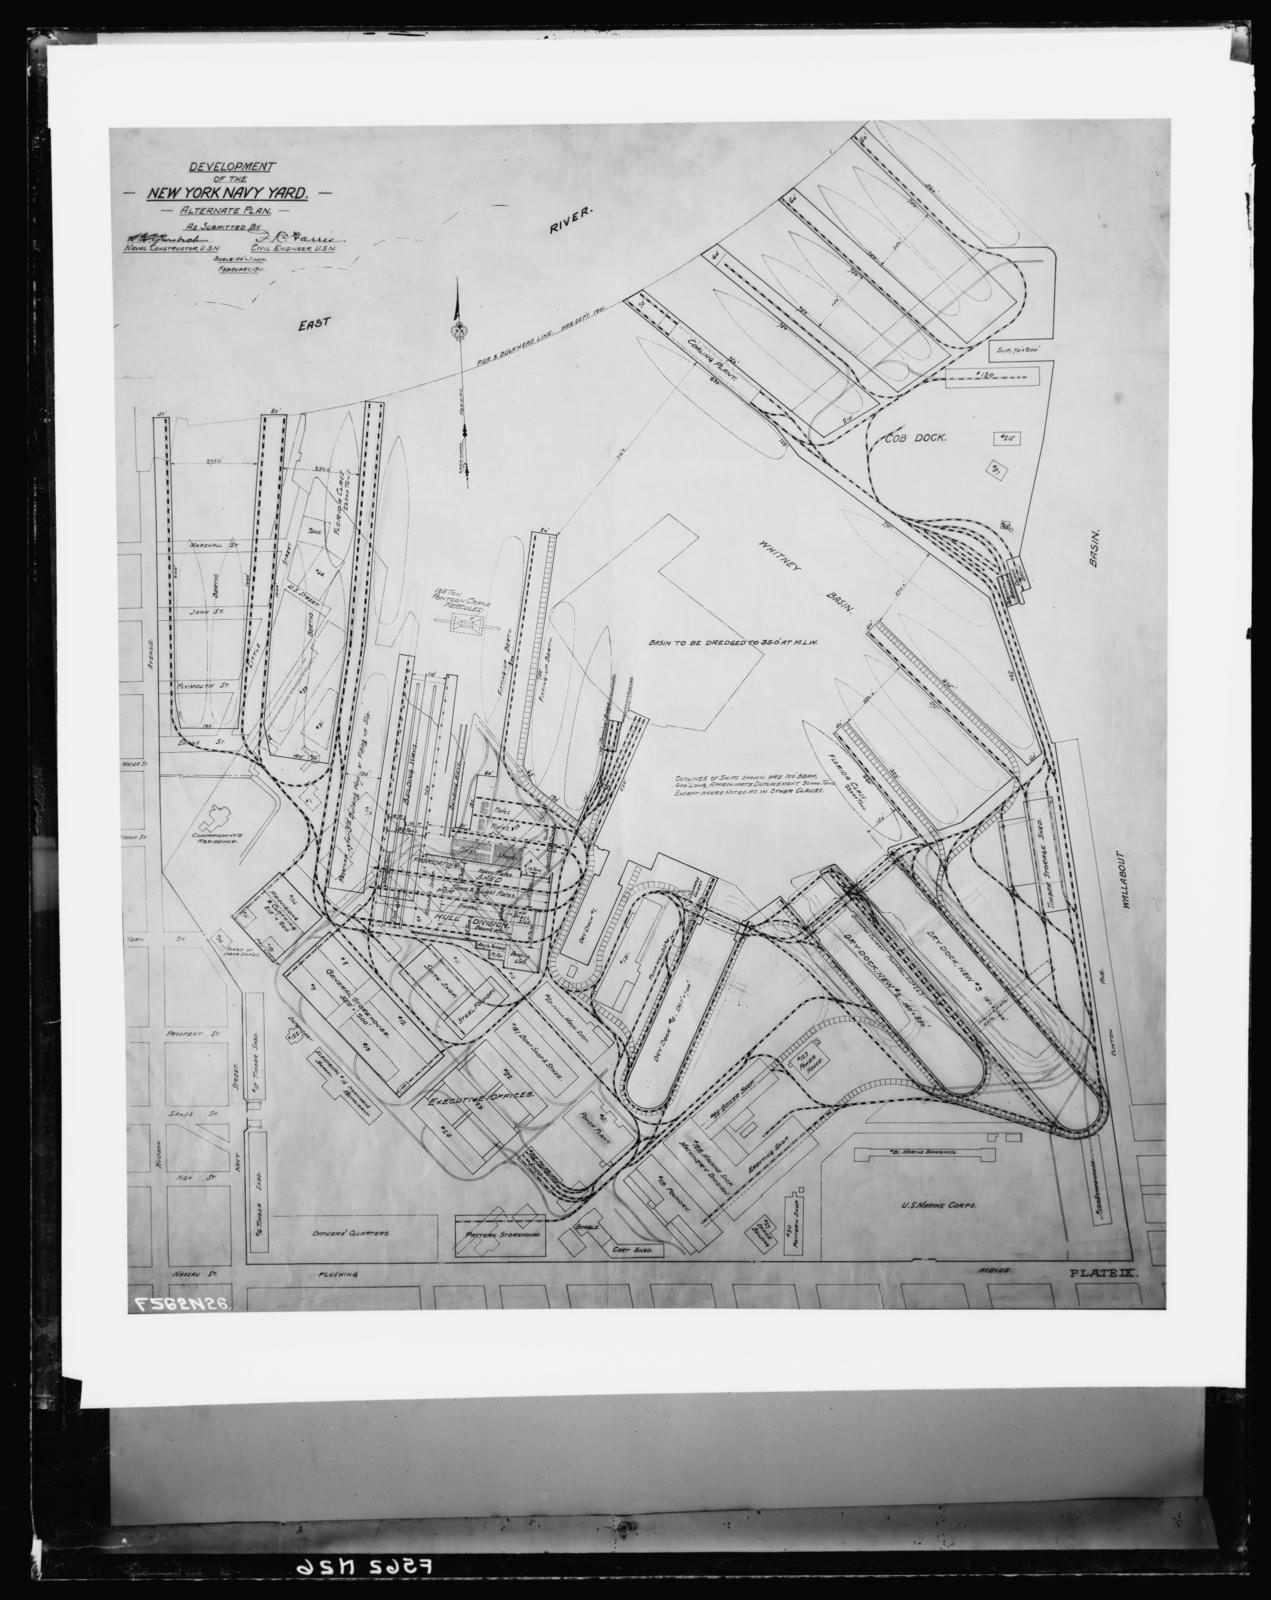 Development of the New York Naval Yard